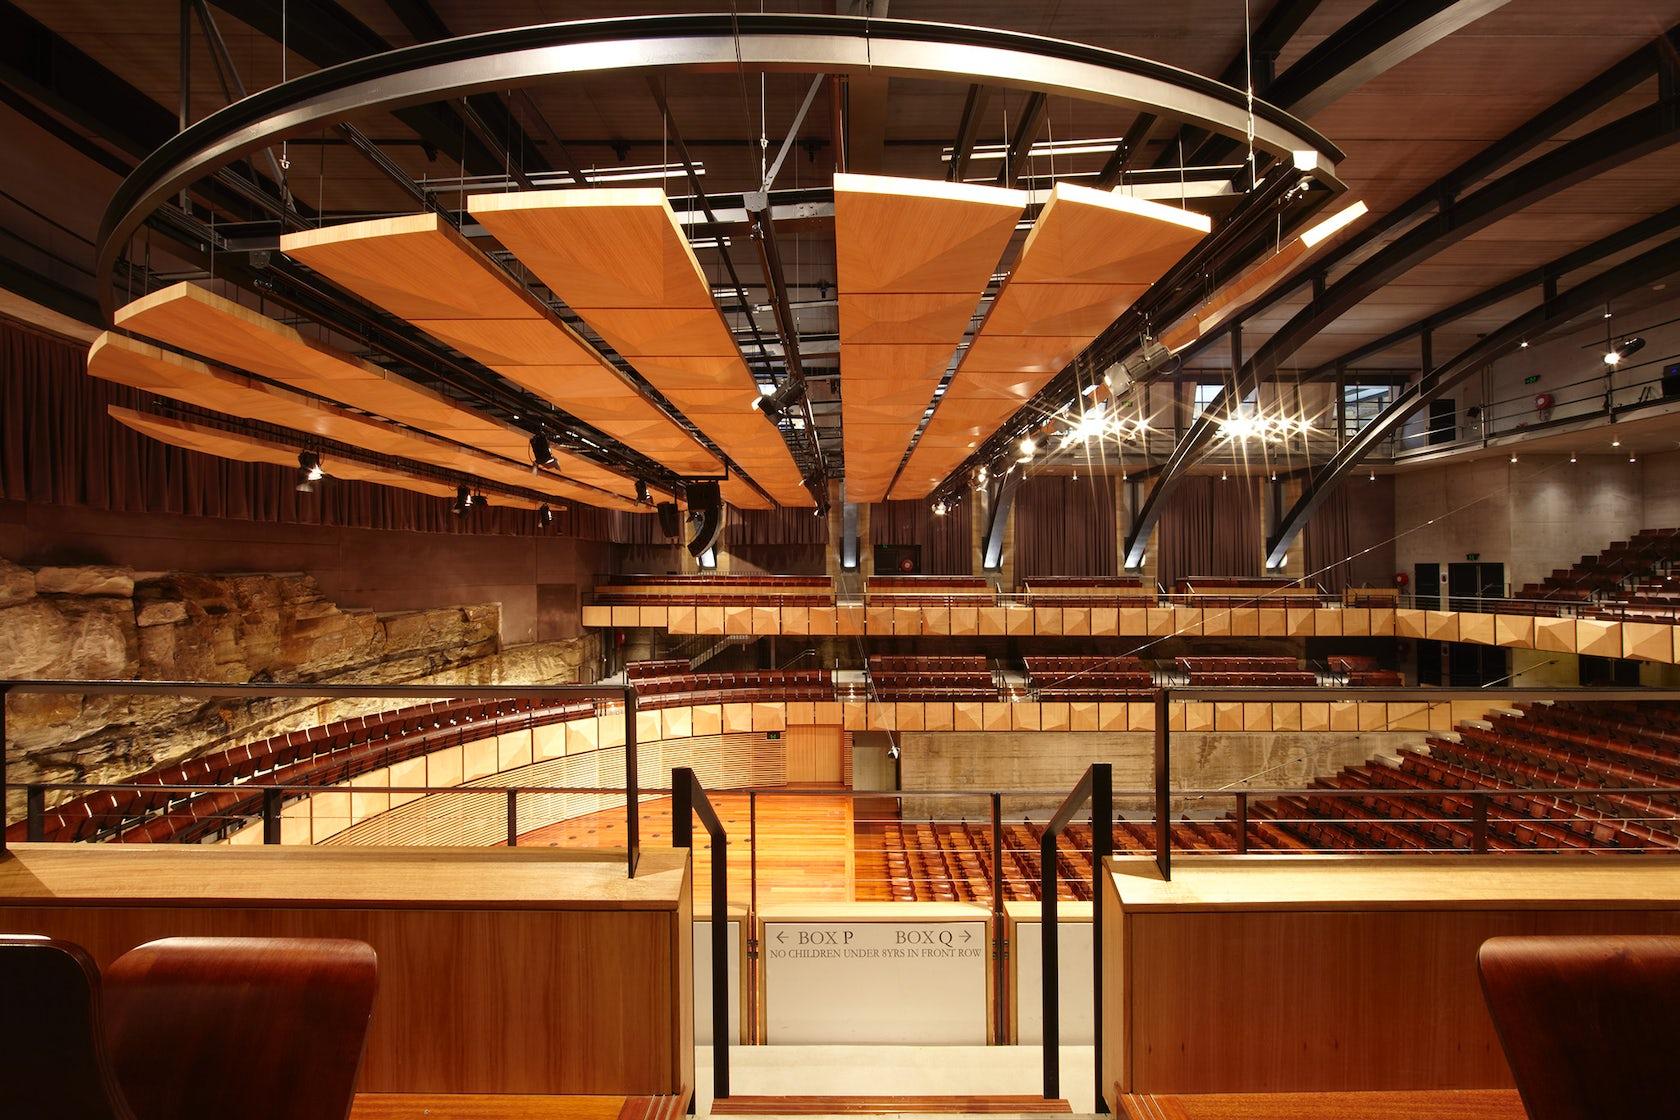 South Street Auto >> Sydney Grammar School Assembly Hall - Architizer